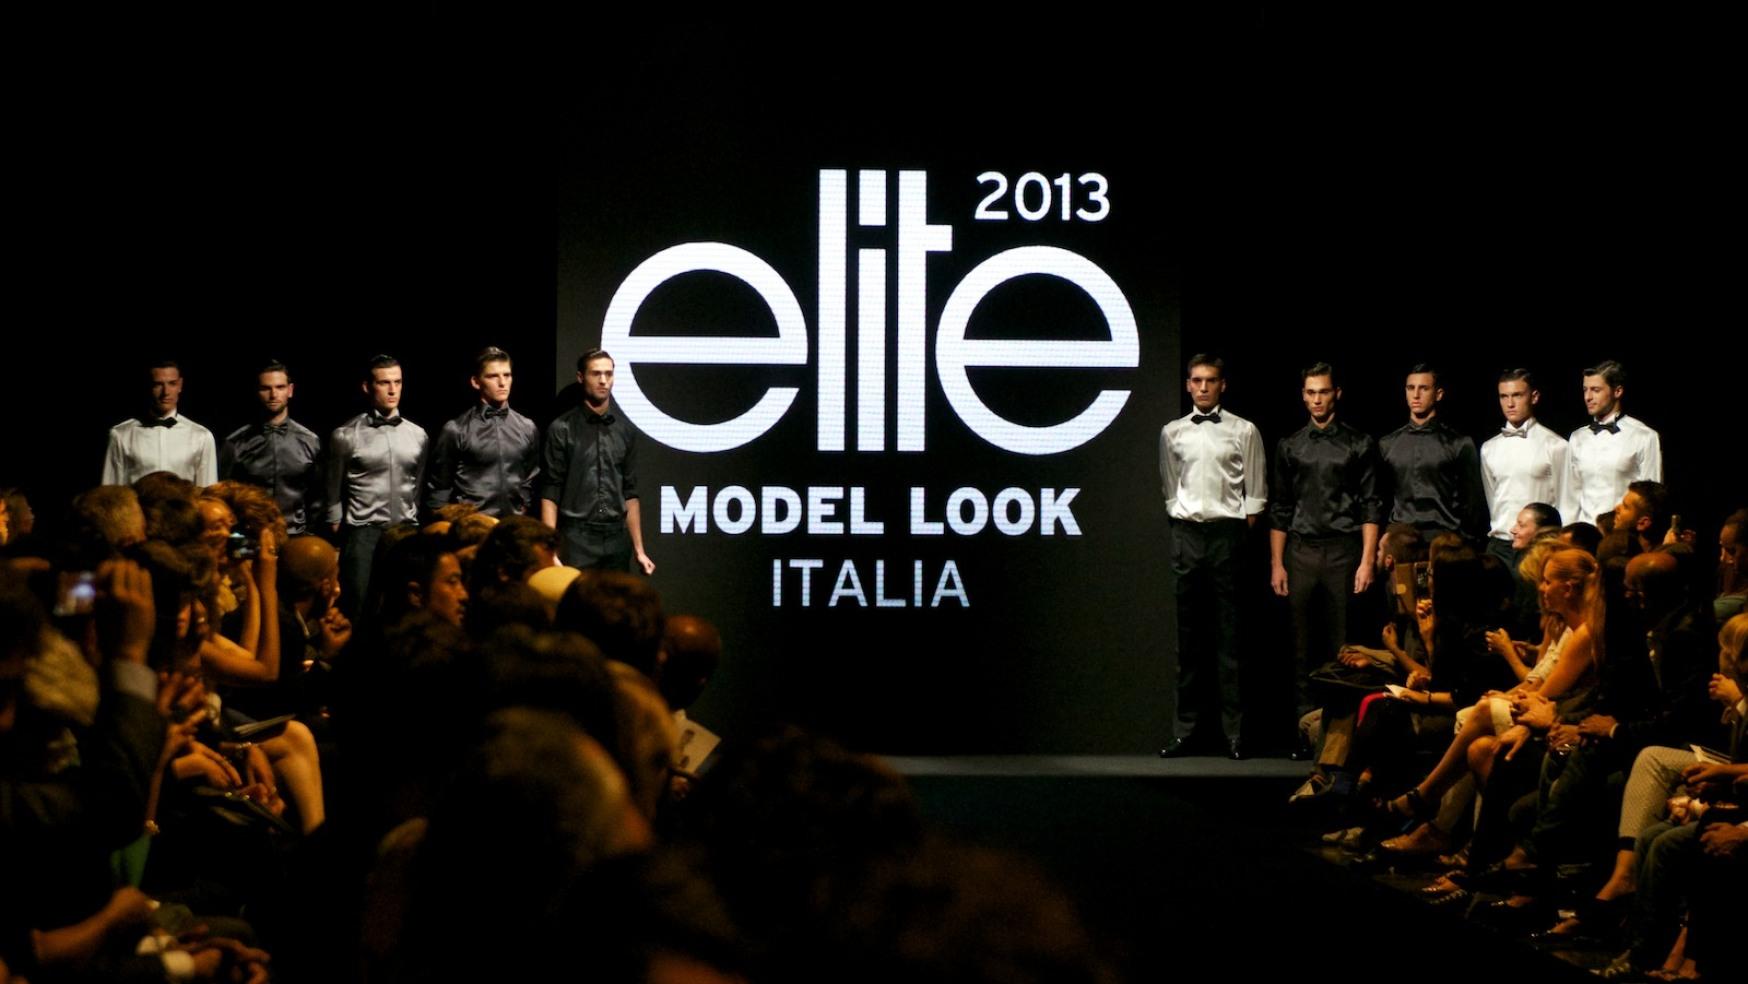 Elite Model Look Italia – The final